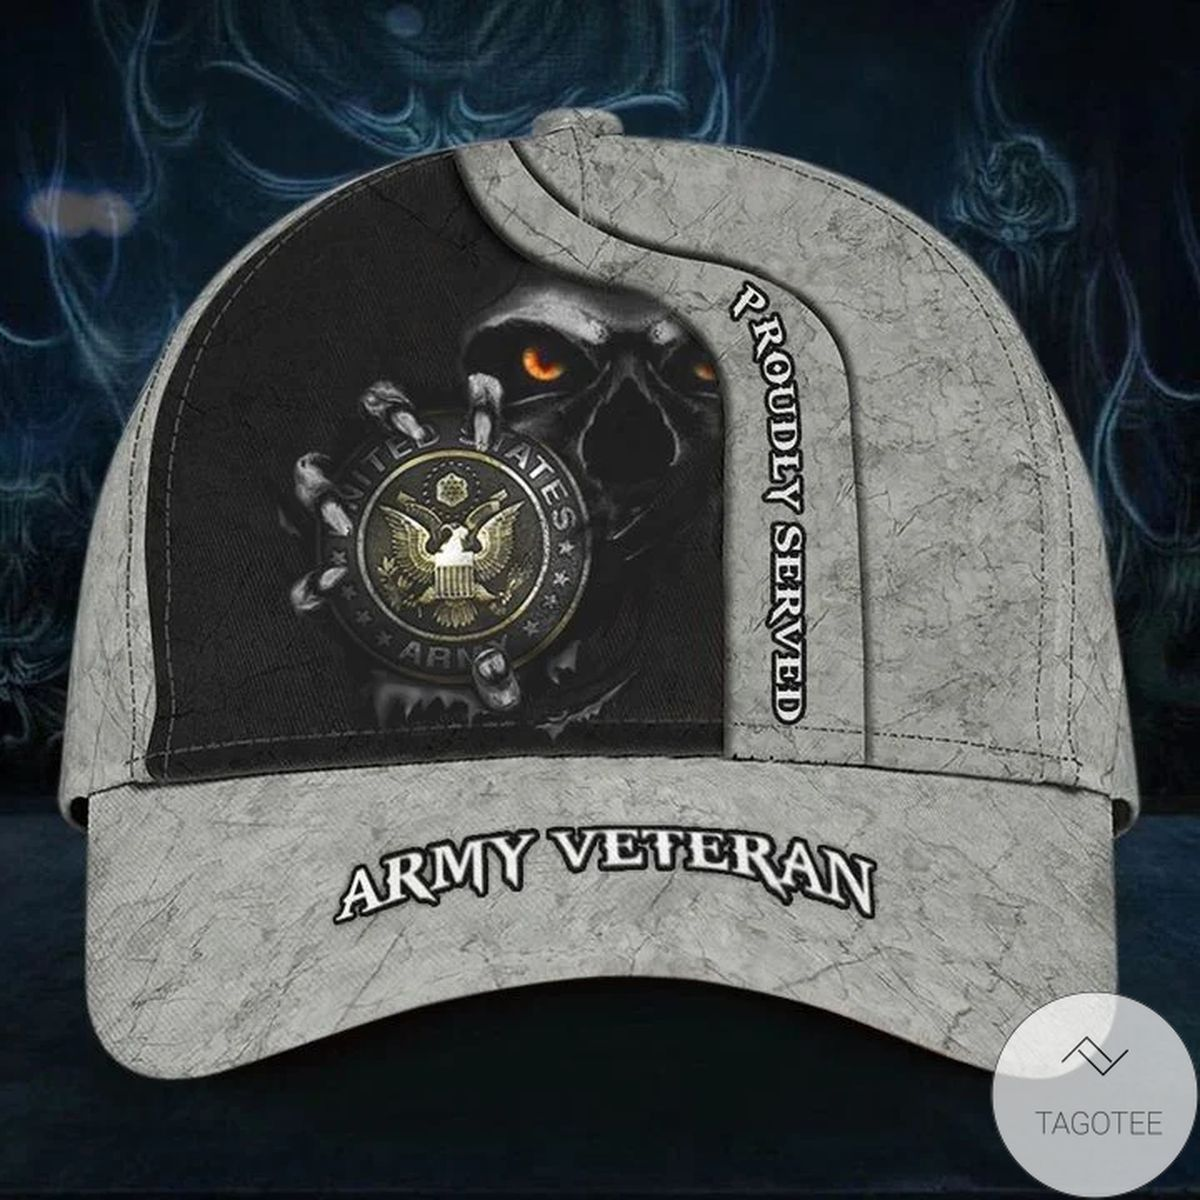 Skull Army Veteran Proudly Served Cap Patriotic Honor Retired Army Veteran Hat Unique Gift